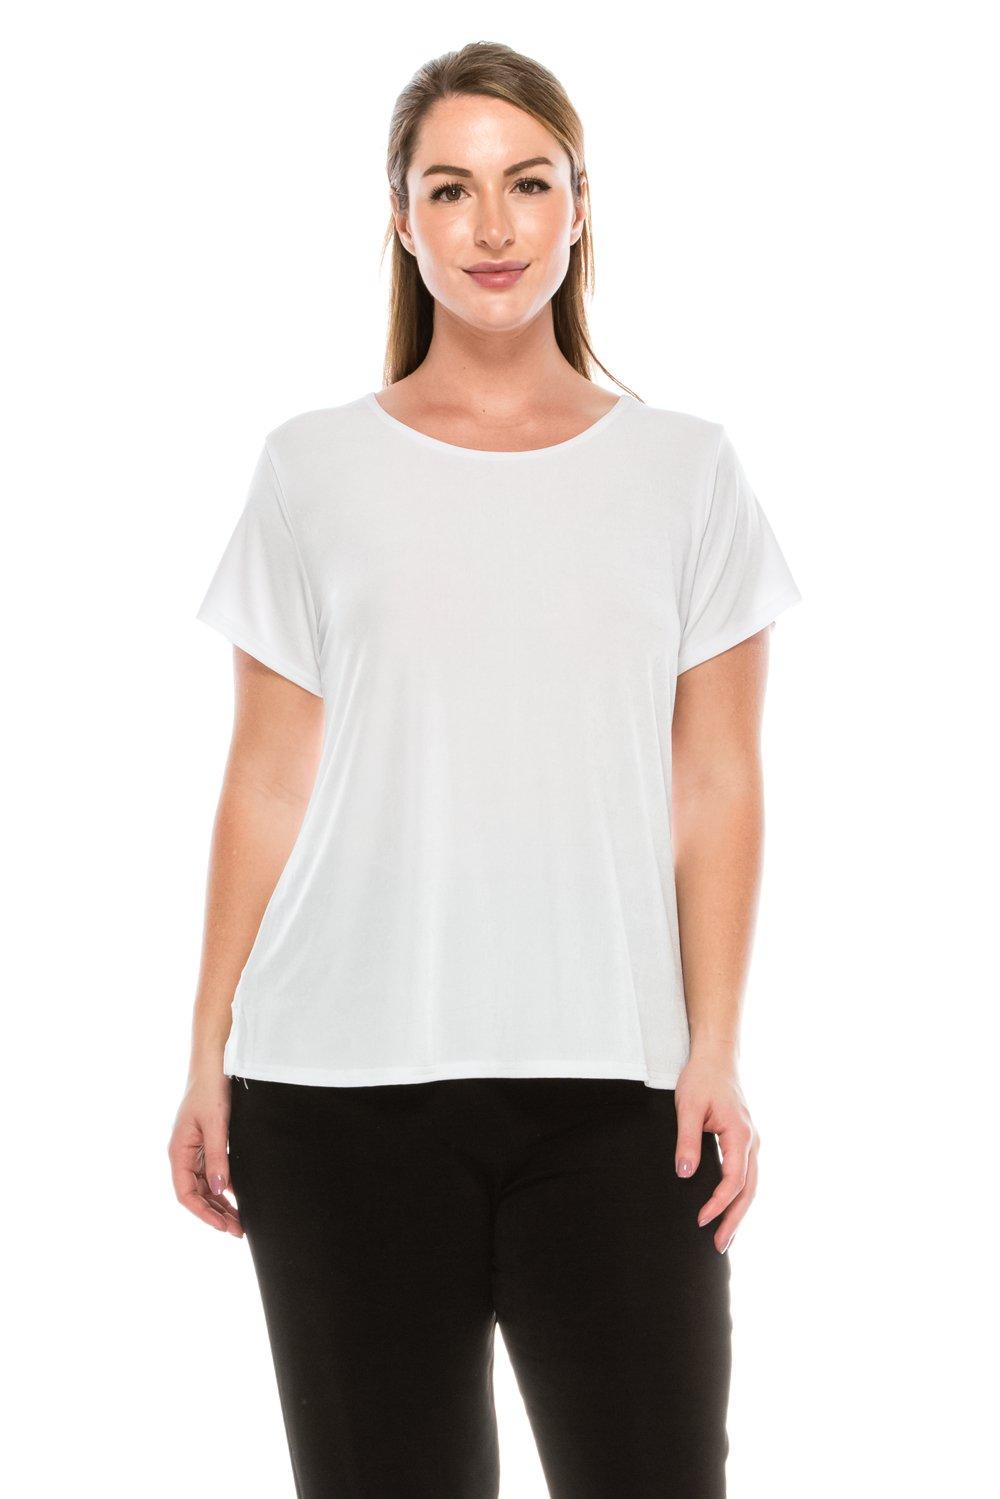 Jostar Women's Stretchy New Big Top Short Sleeve